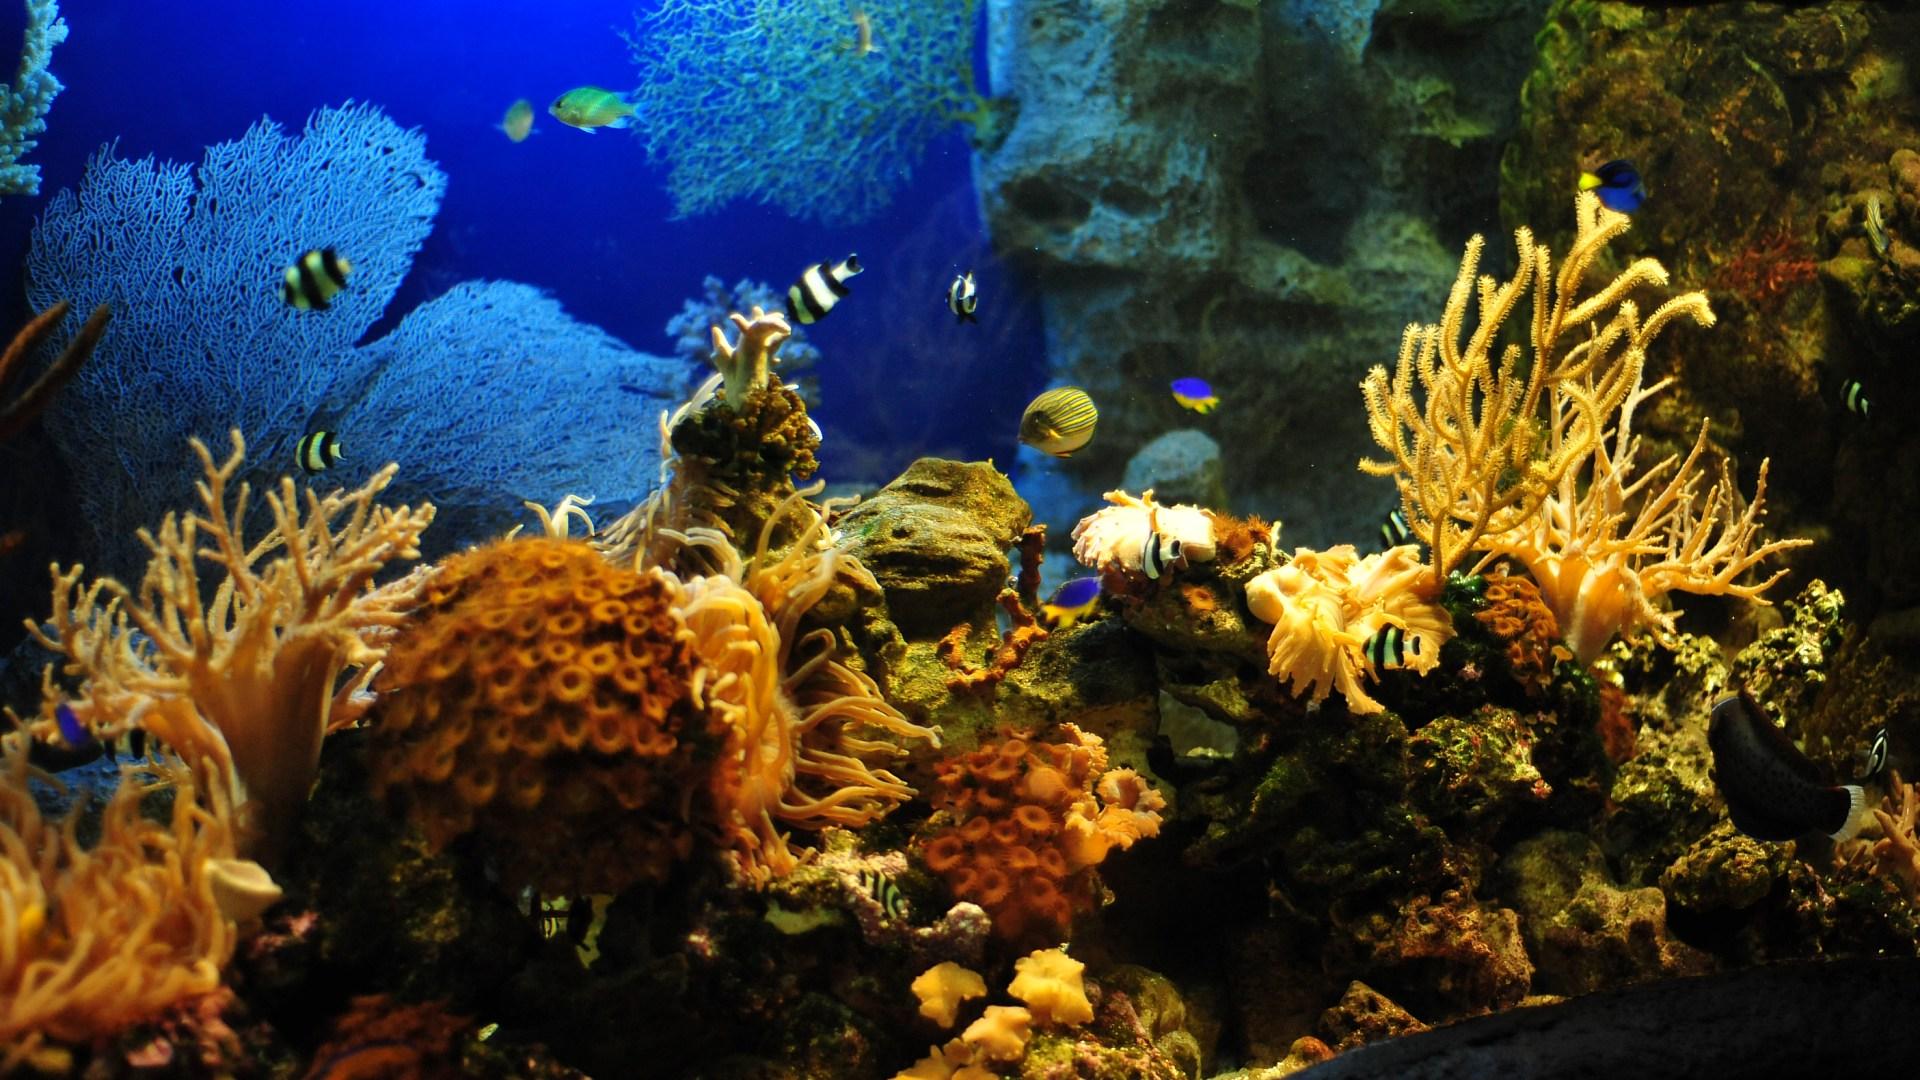 aquarium background attractive wallpaper freewares image 1920x1080